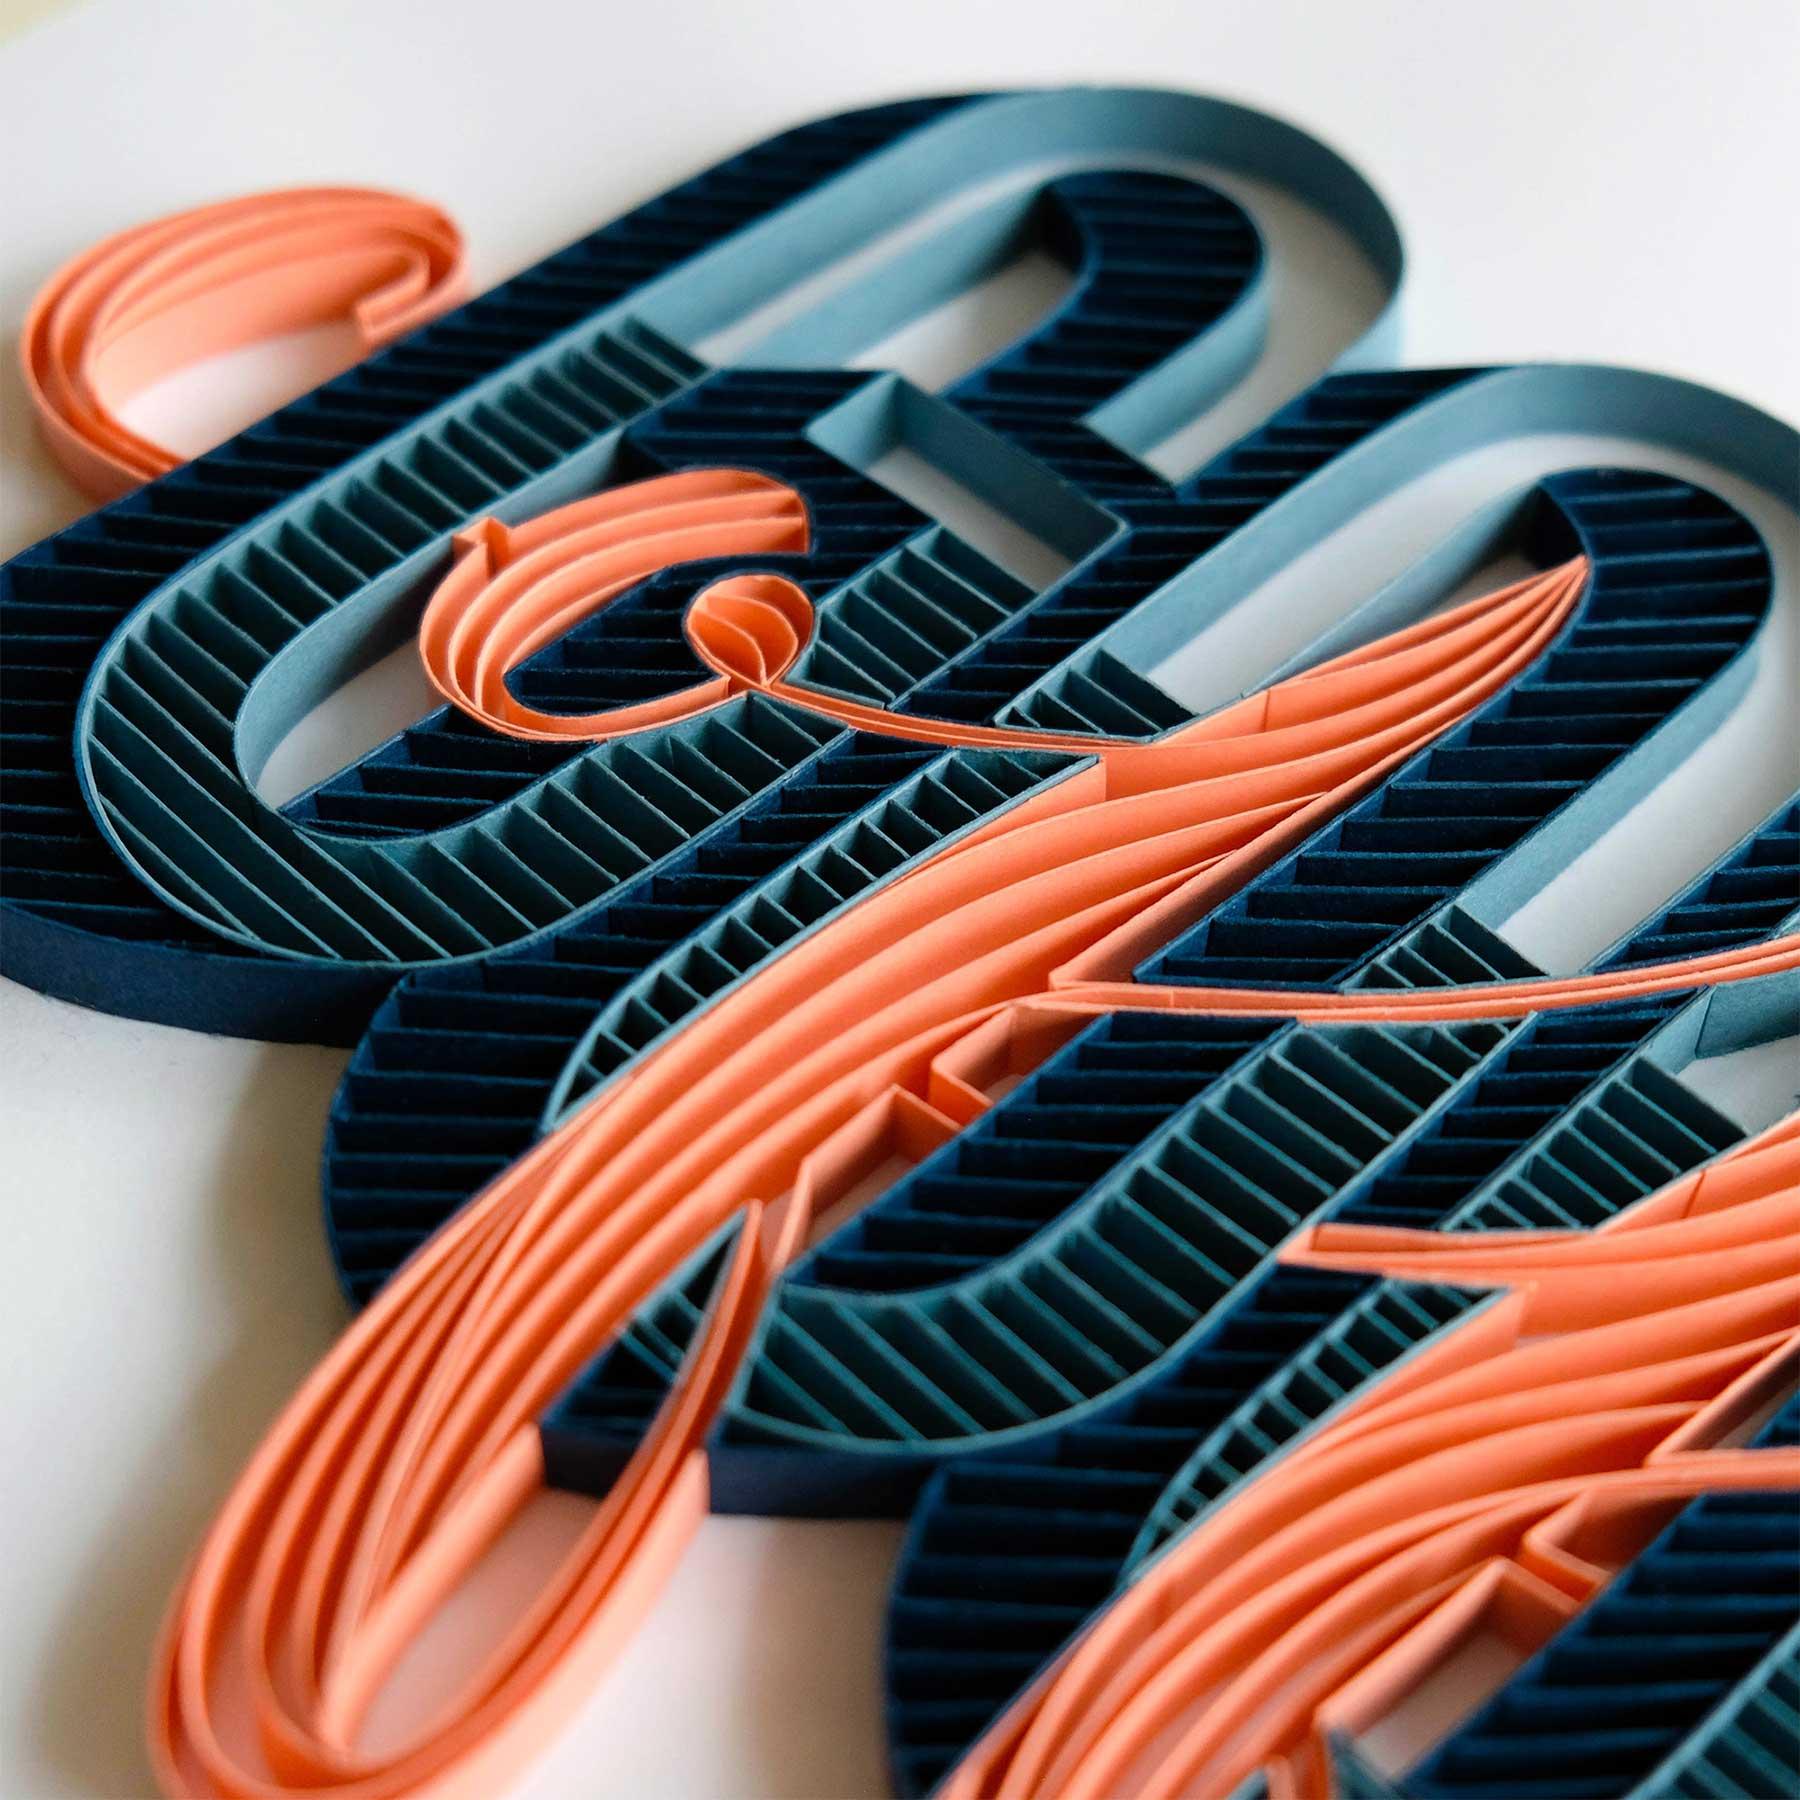 3D-Papier-Lettering von Alia Bright Alia-Bright-paperlettering_02